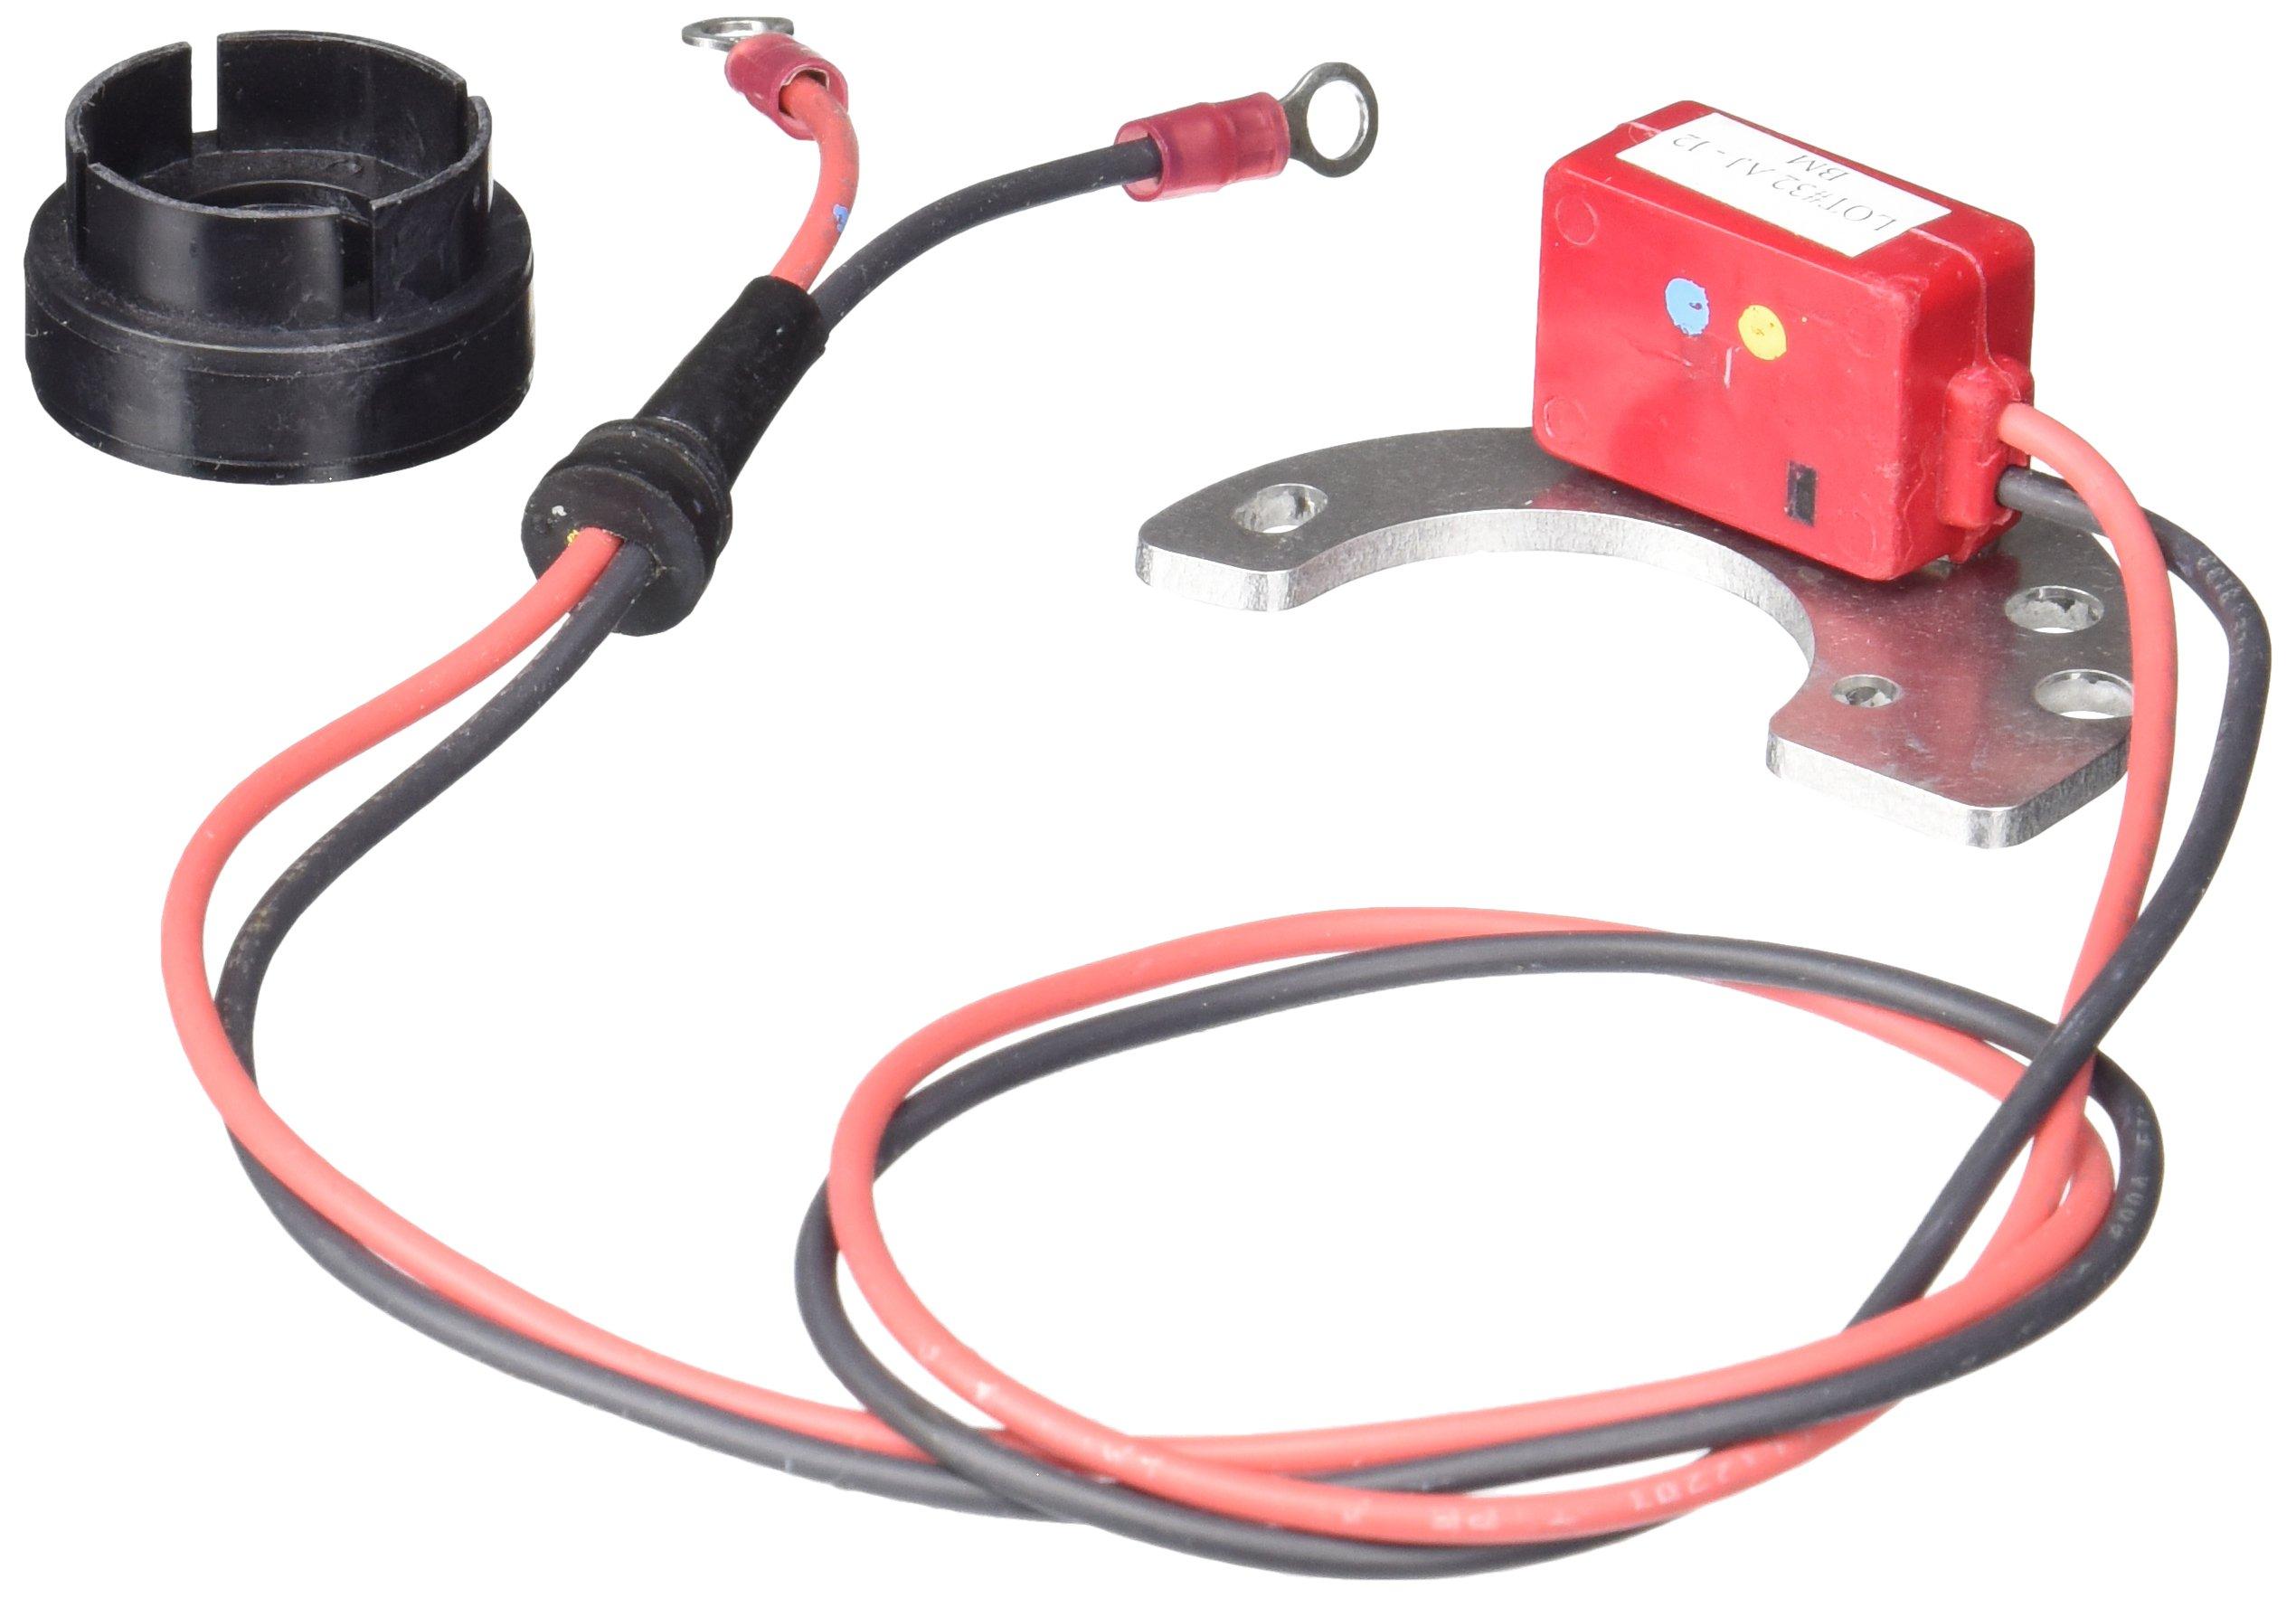 Pertronix 9MC-181 Ignitor II Adaptive Dwell Control for Mercury Marine 8 Cylinder by Pertronix